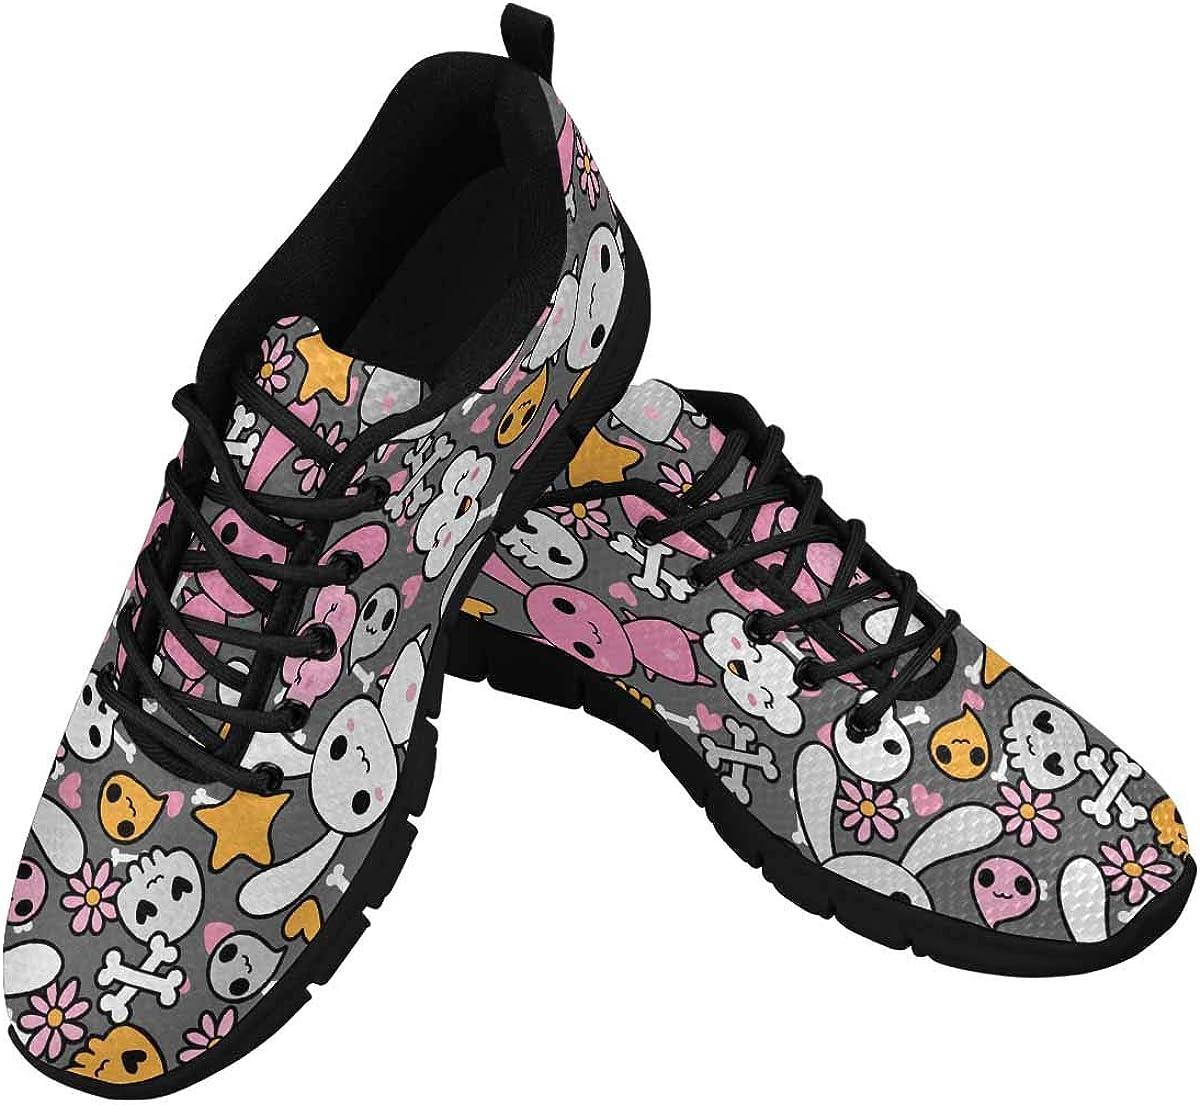 InterestPrint Cute Kawaii Pattern Pink Women's Breathable Comfort Mesh Fashion Sneakers